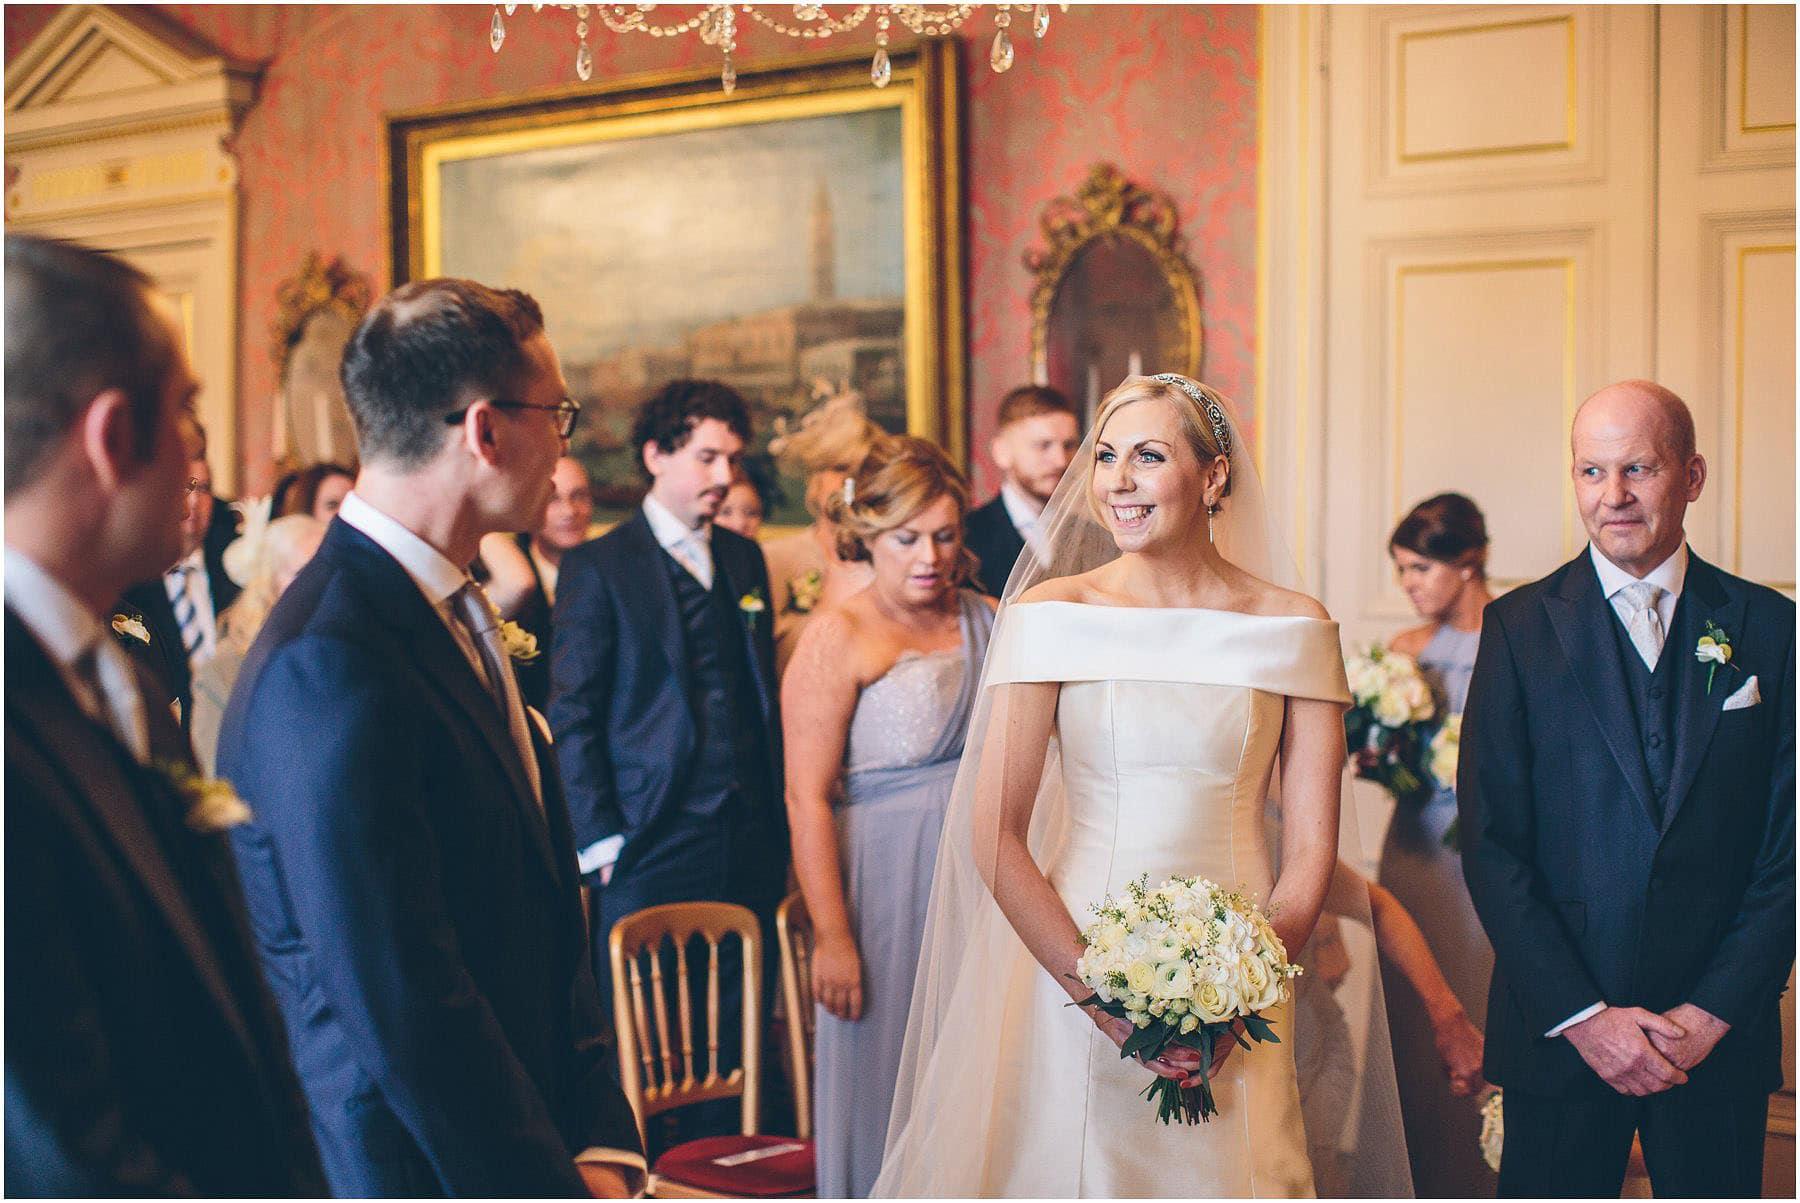 Capesthorne_Hall_Wedding_Photography_0045